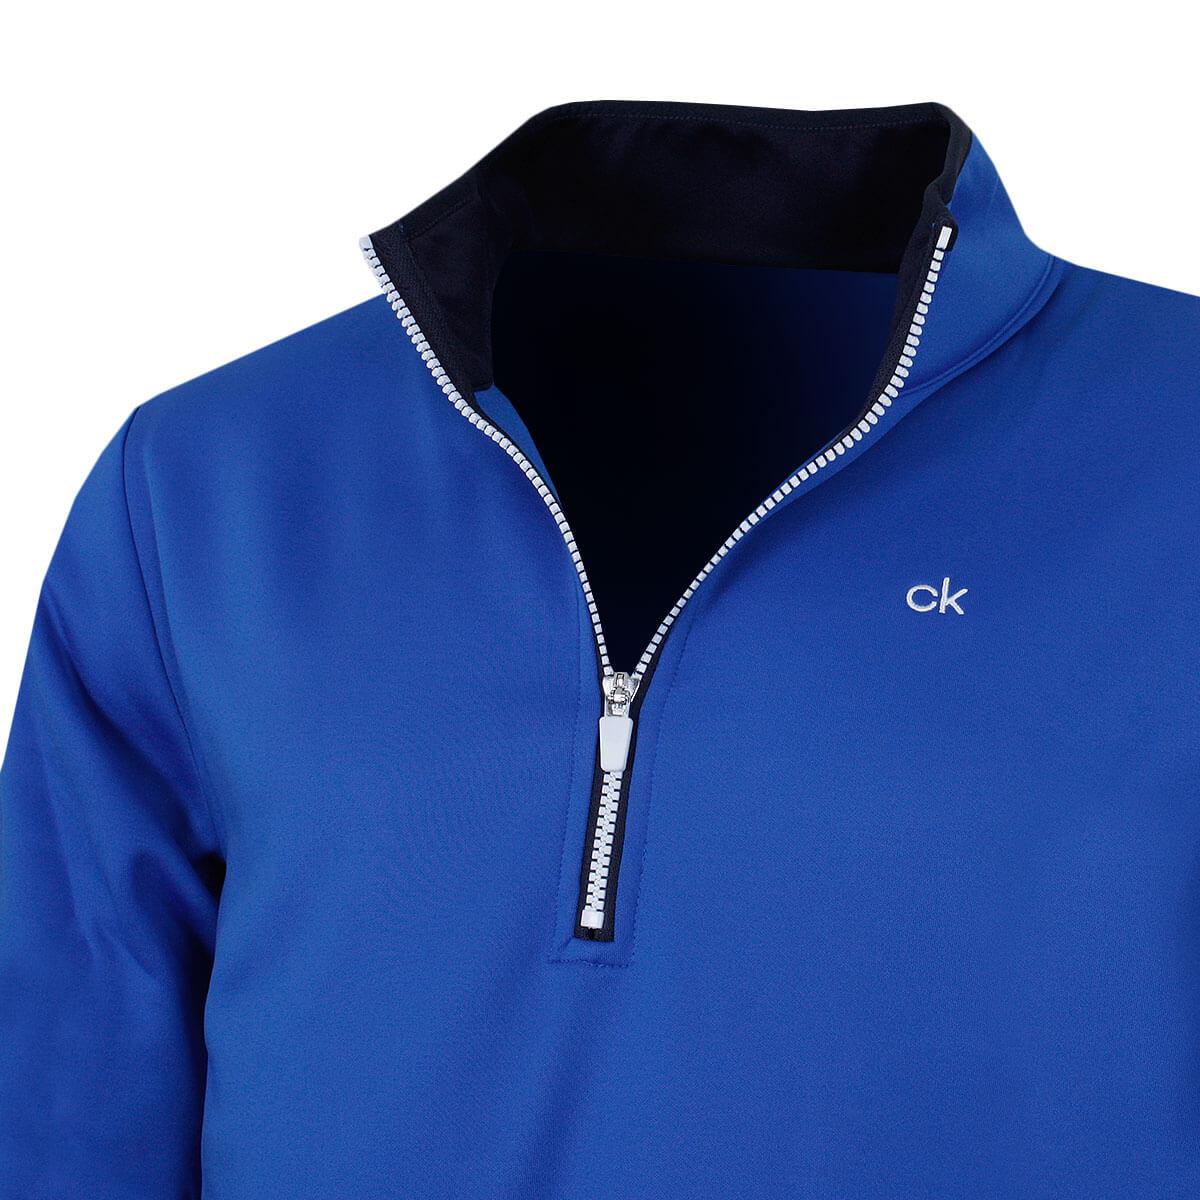 Calvin-Klein-Golf-Para-Hombre-Sueter-Ligero-rendimiento-con-cremallera-de-2019-1-2-50-De-Descuento miniatura 10